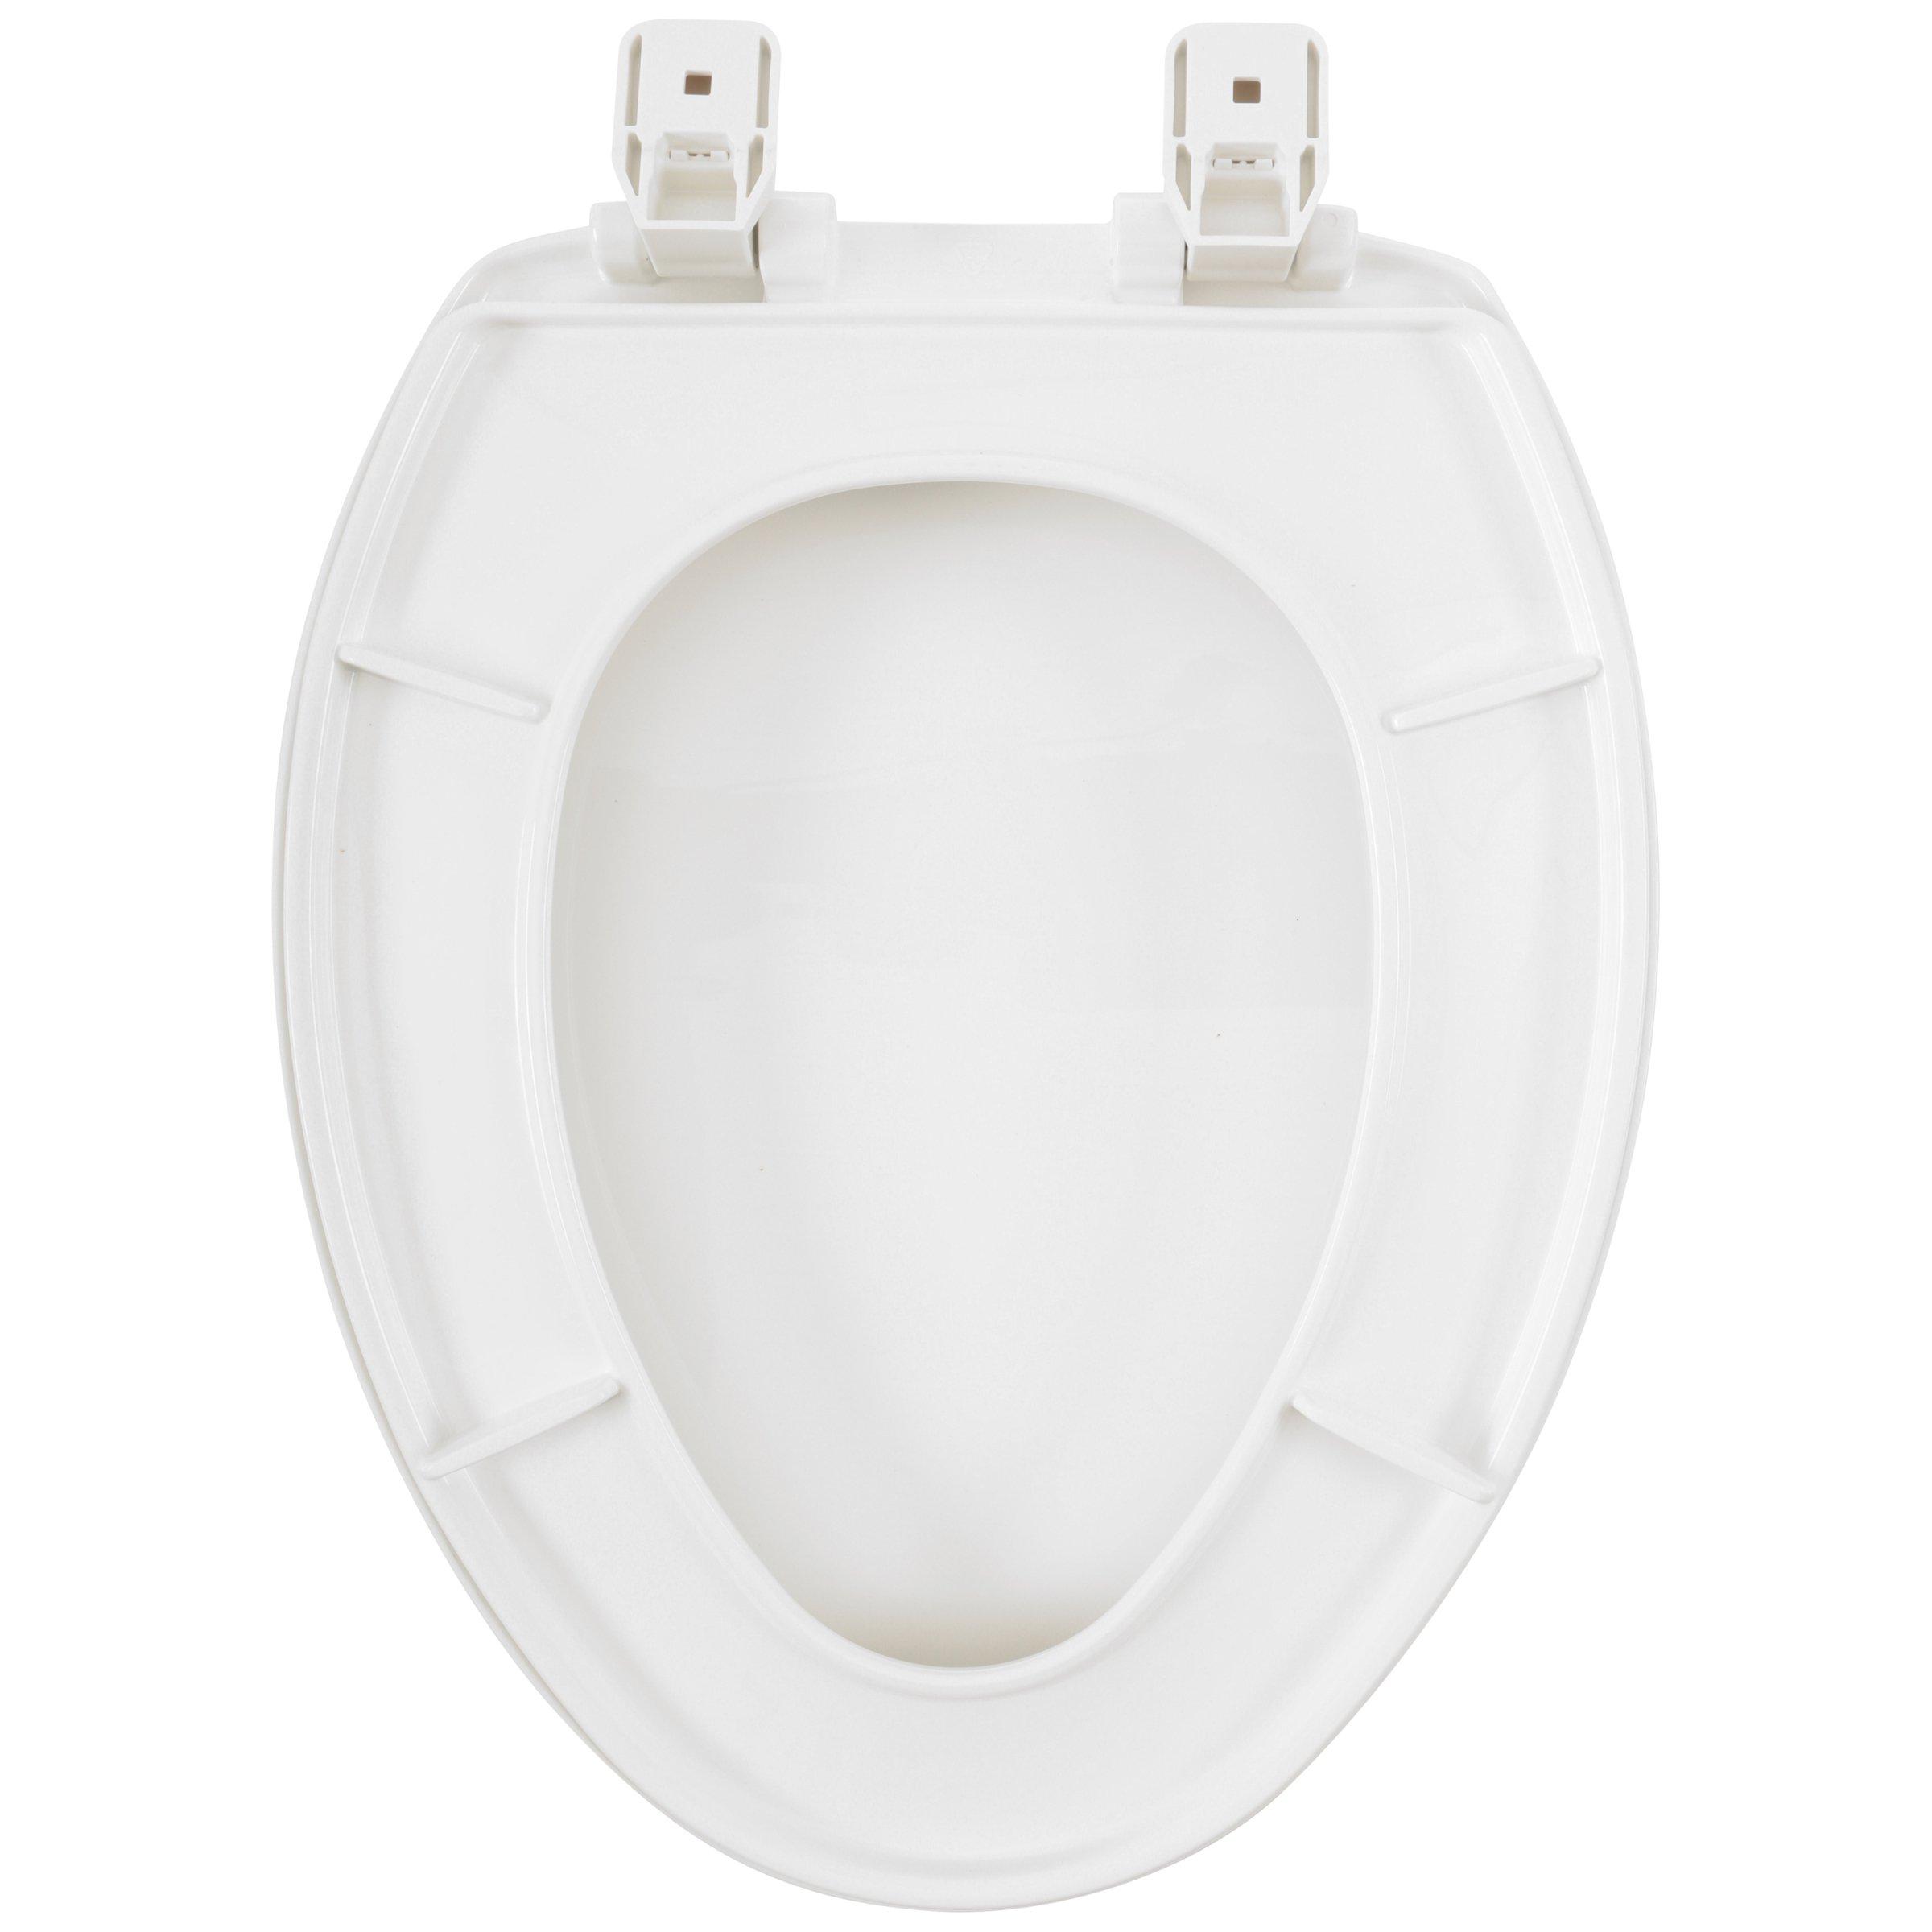 Tremendous Mayfair Elongated Toilet Seat With Sta Tite System Walmart Com Evergreenethics Interior Chair Design Evergreenethicsorg